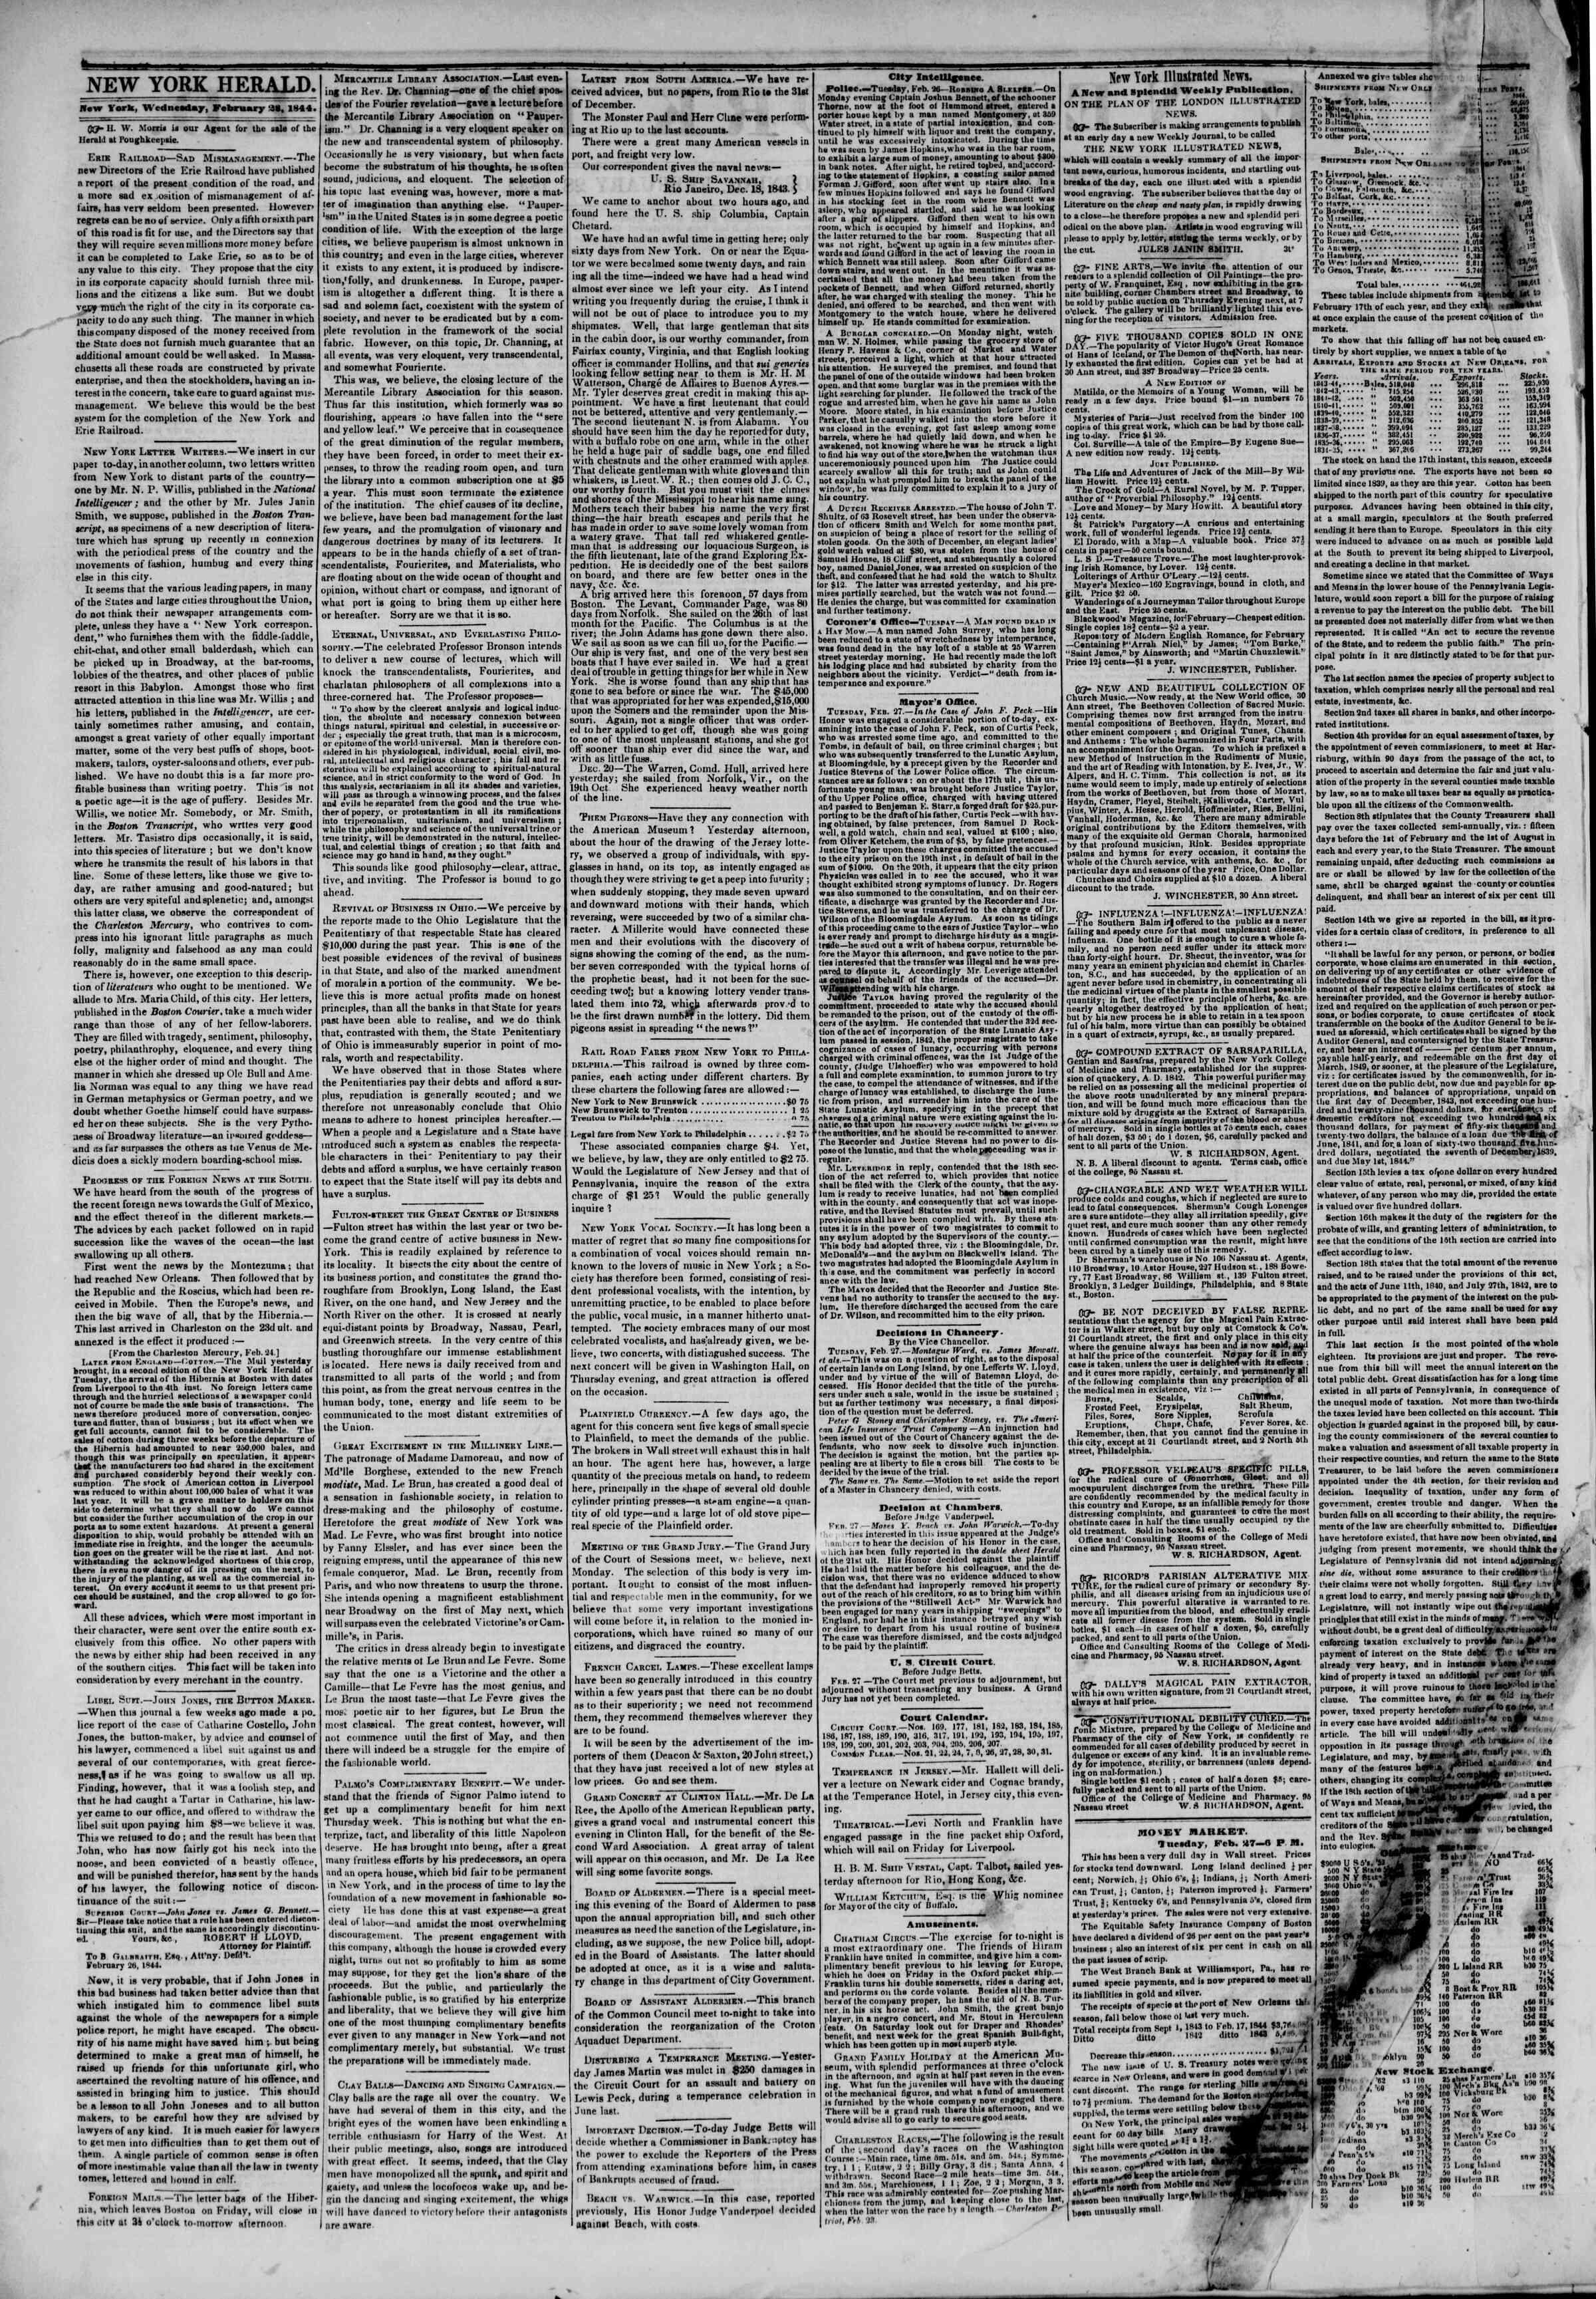 February 28, 1844 Tarihli The New York Herald Gazetesi Sayfa 2